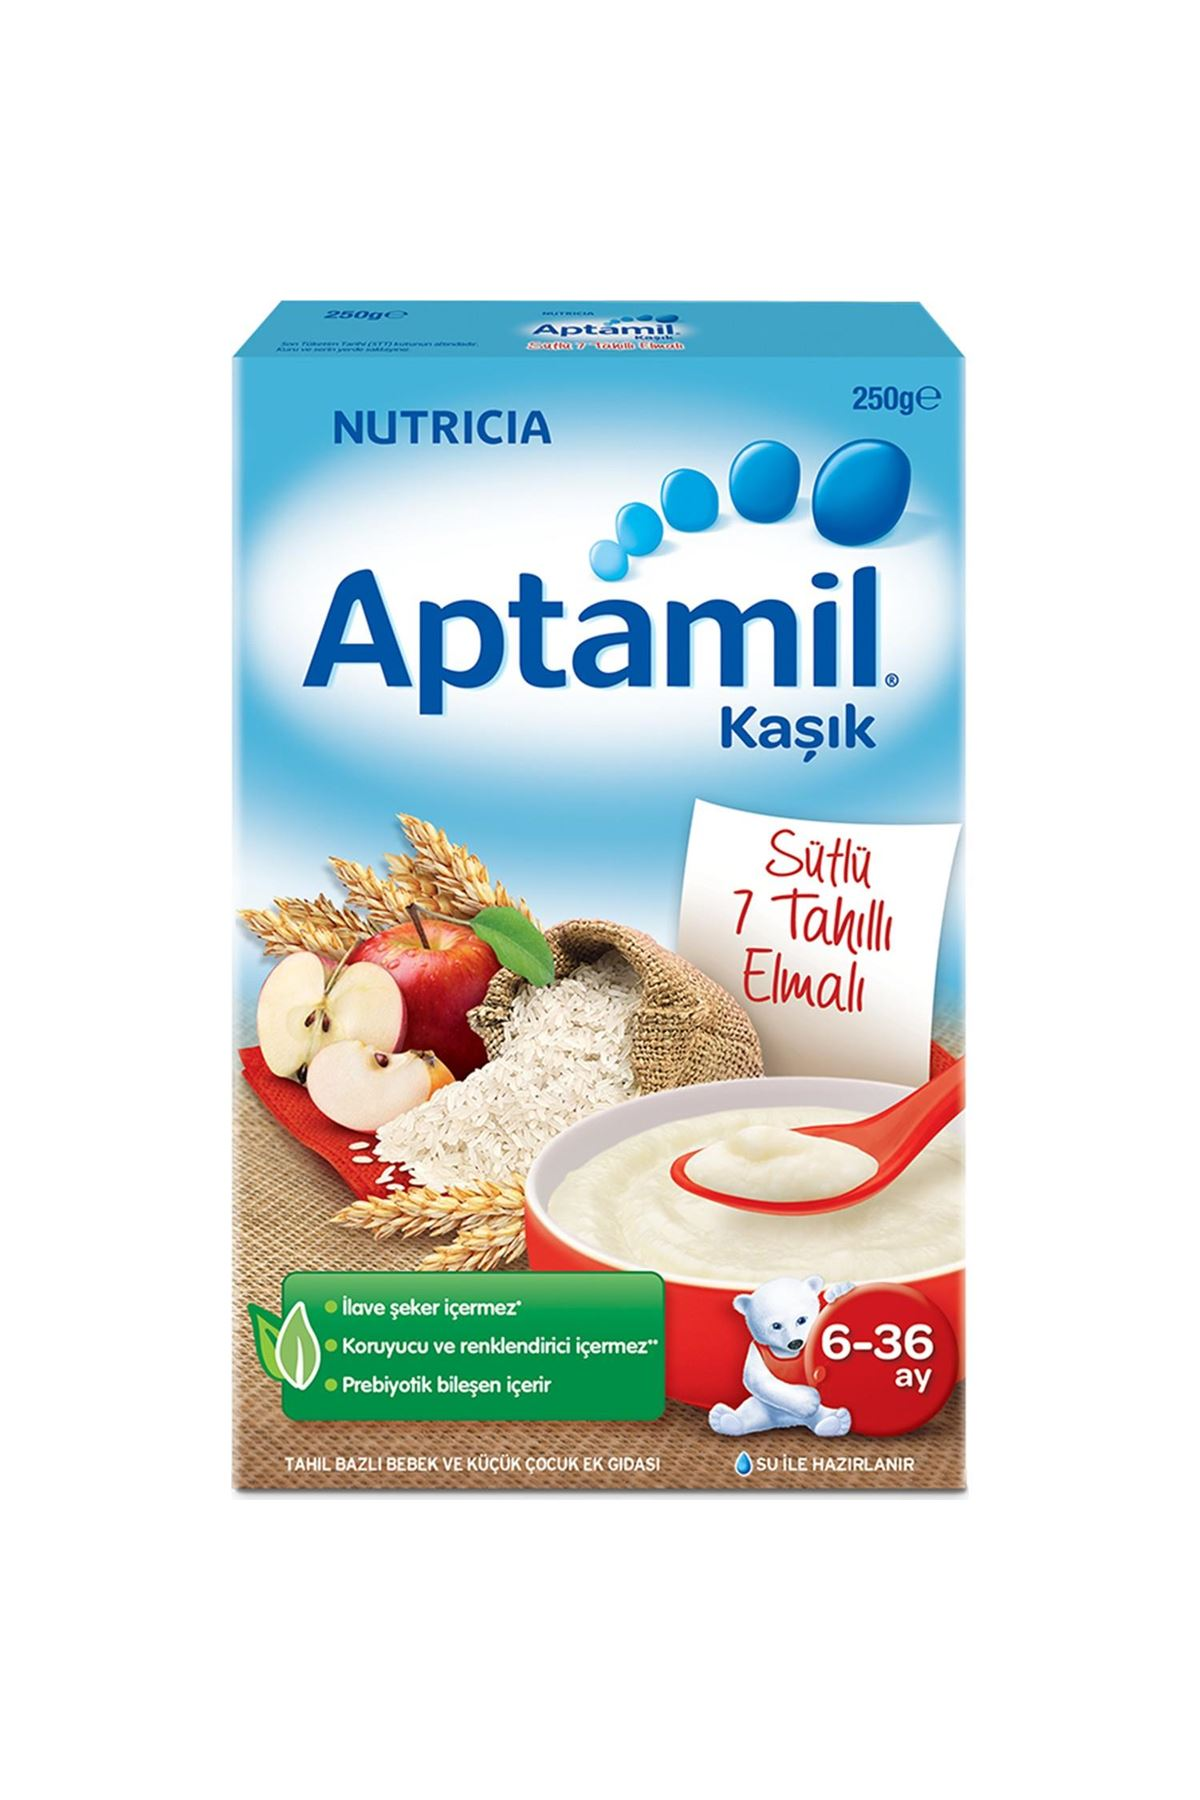 Aptamil Kaşık Sütlü 7 Tahıllı Elmalı Kaşık Maması 250 Gr